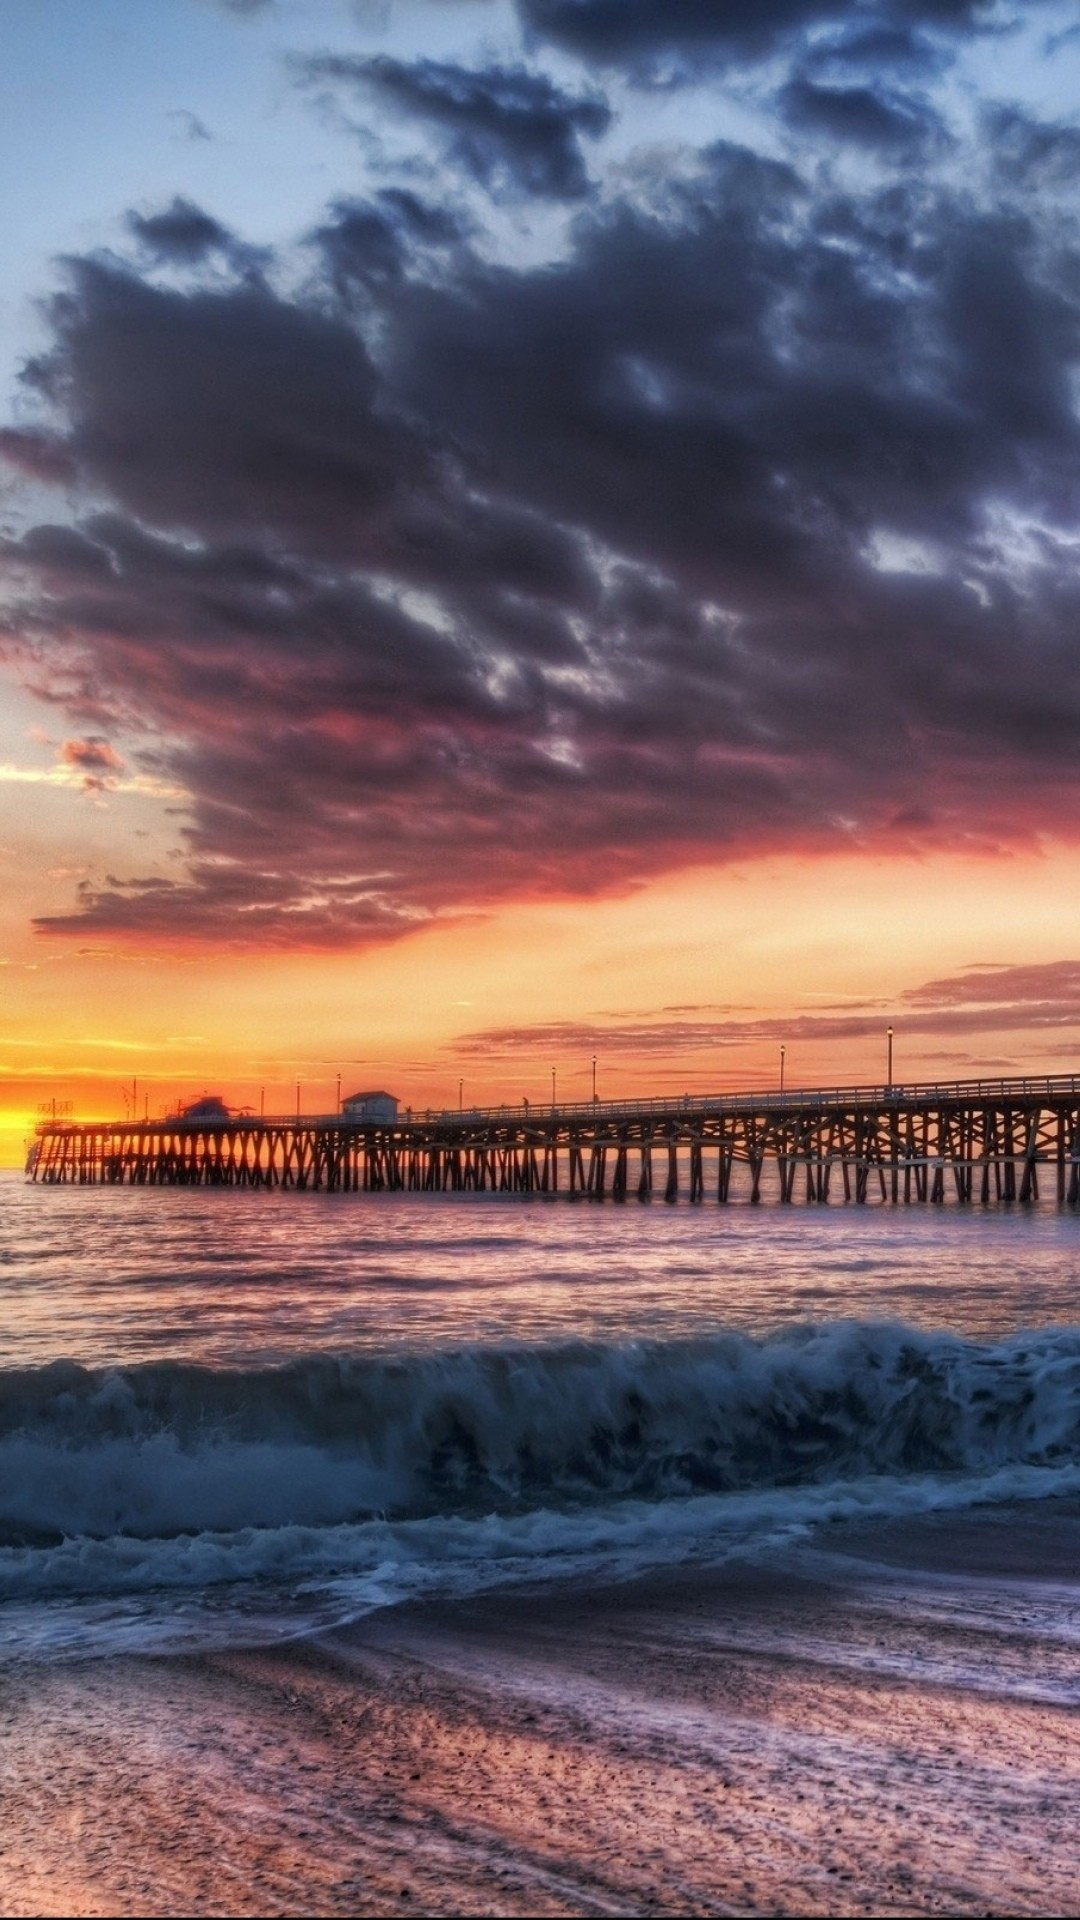 California Beach Dock Sunset iPhone 6 Wallpaper Download   iPhone .